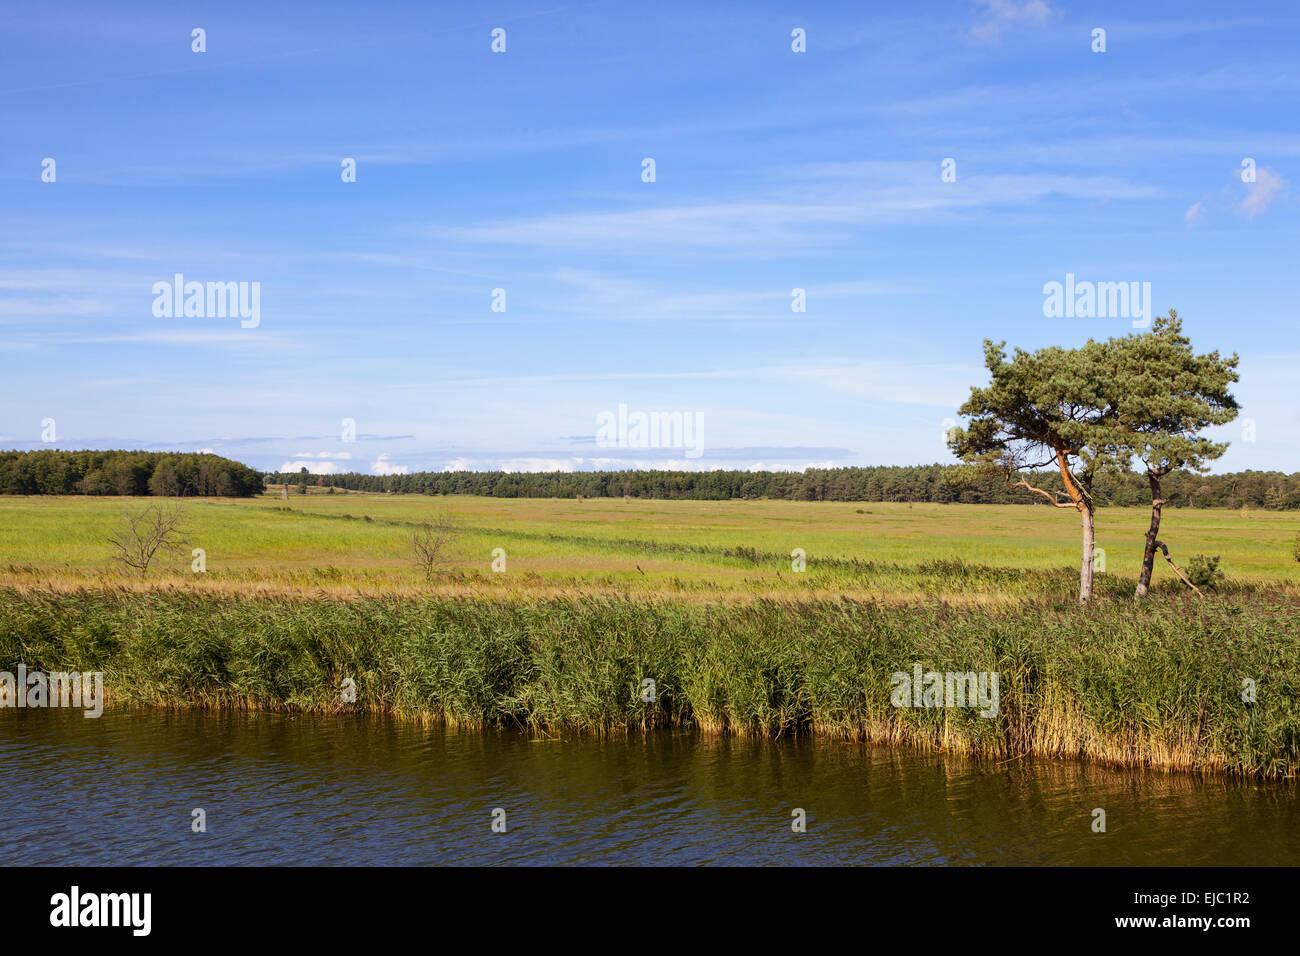 Boddenlandscape - Stock Image